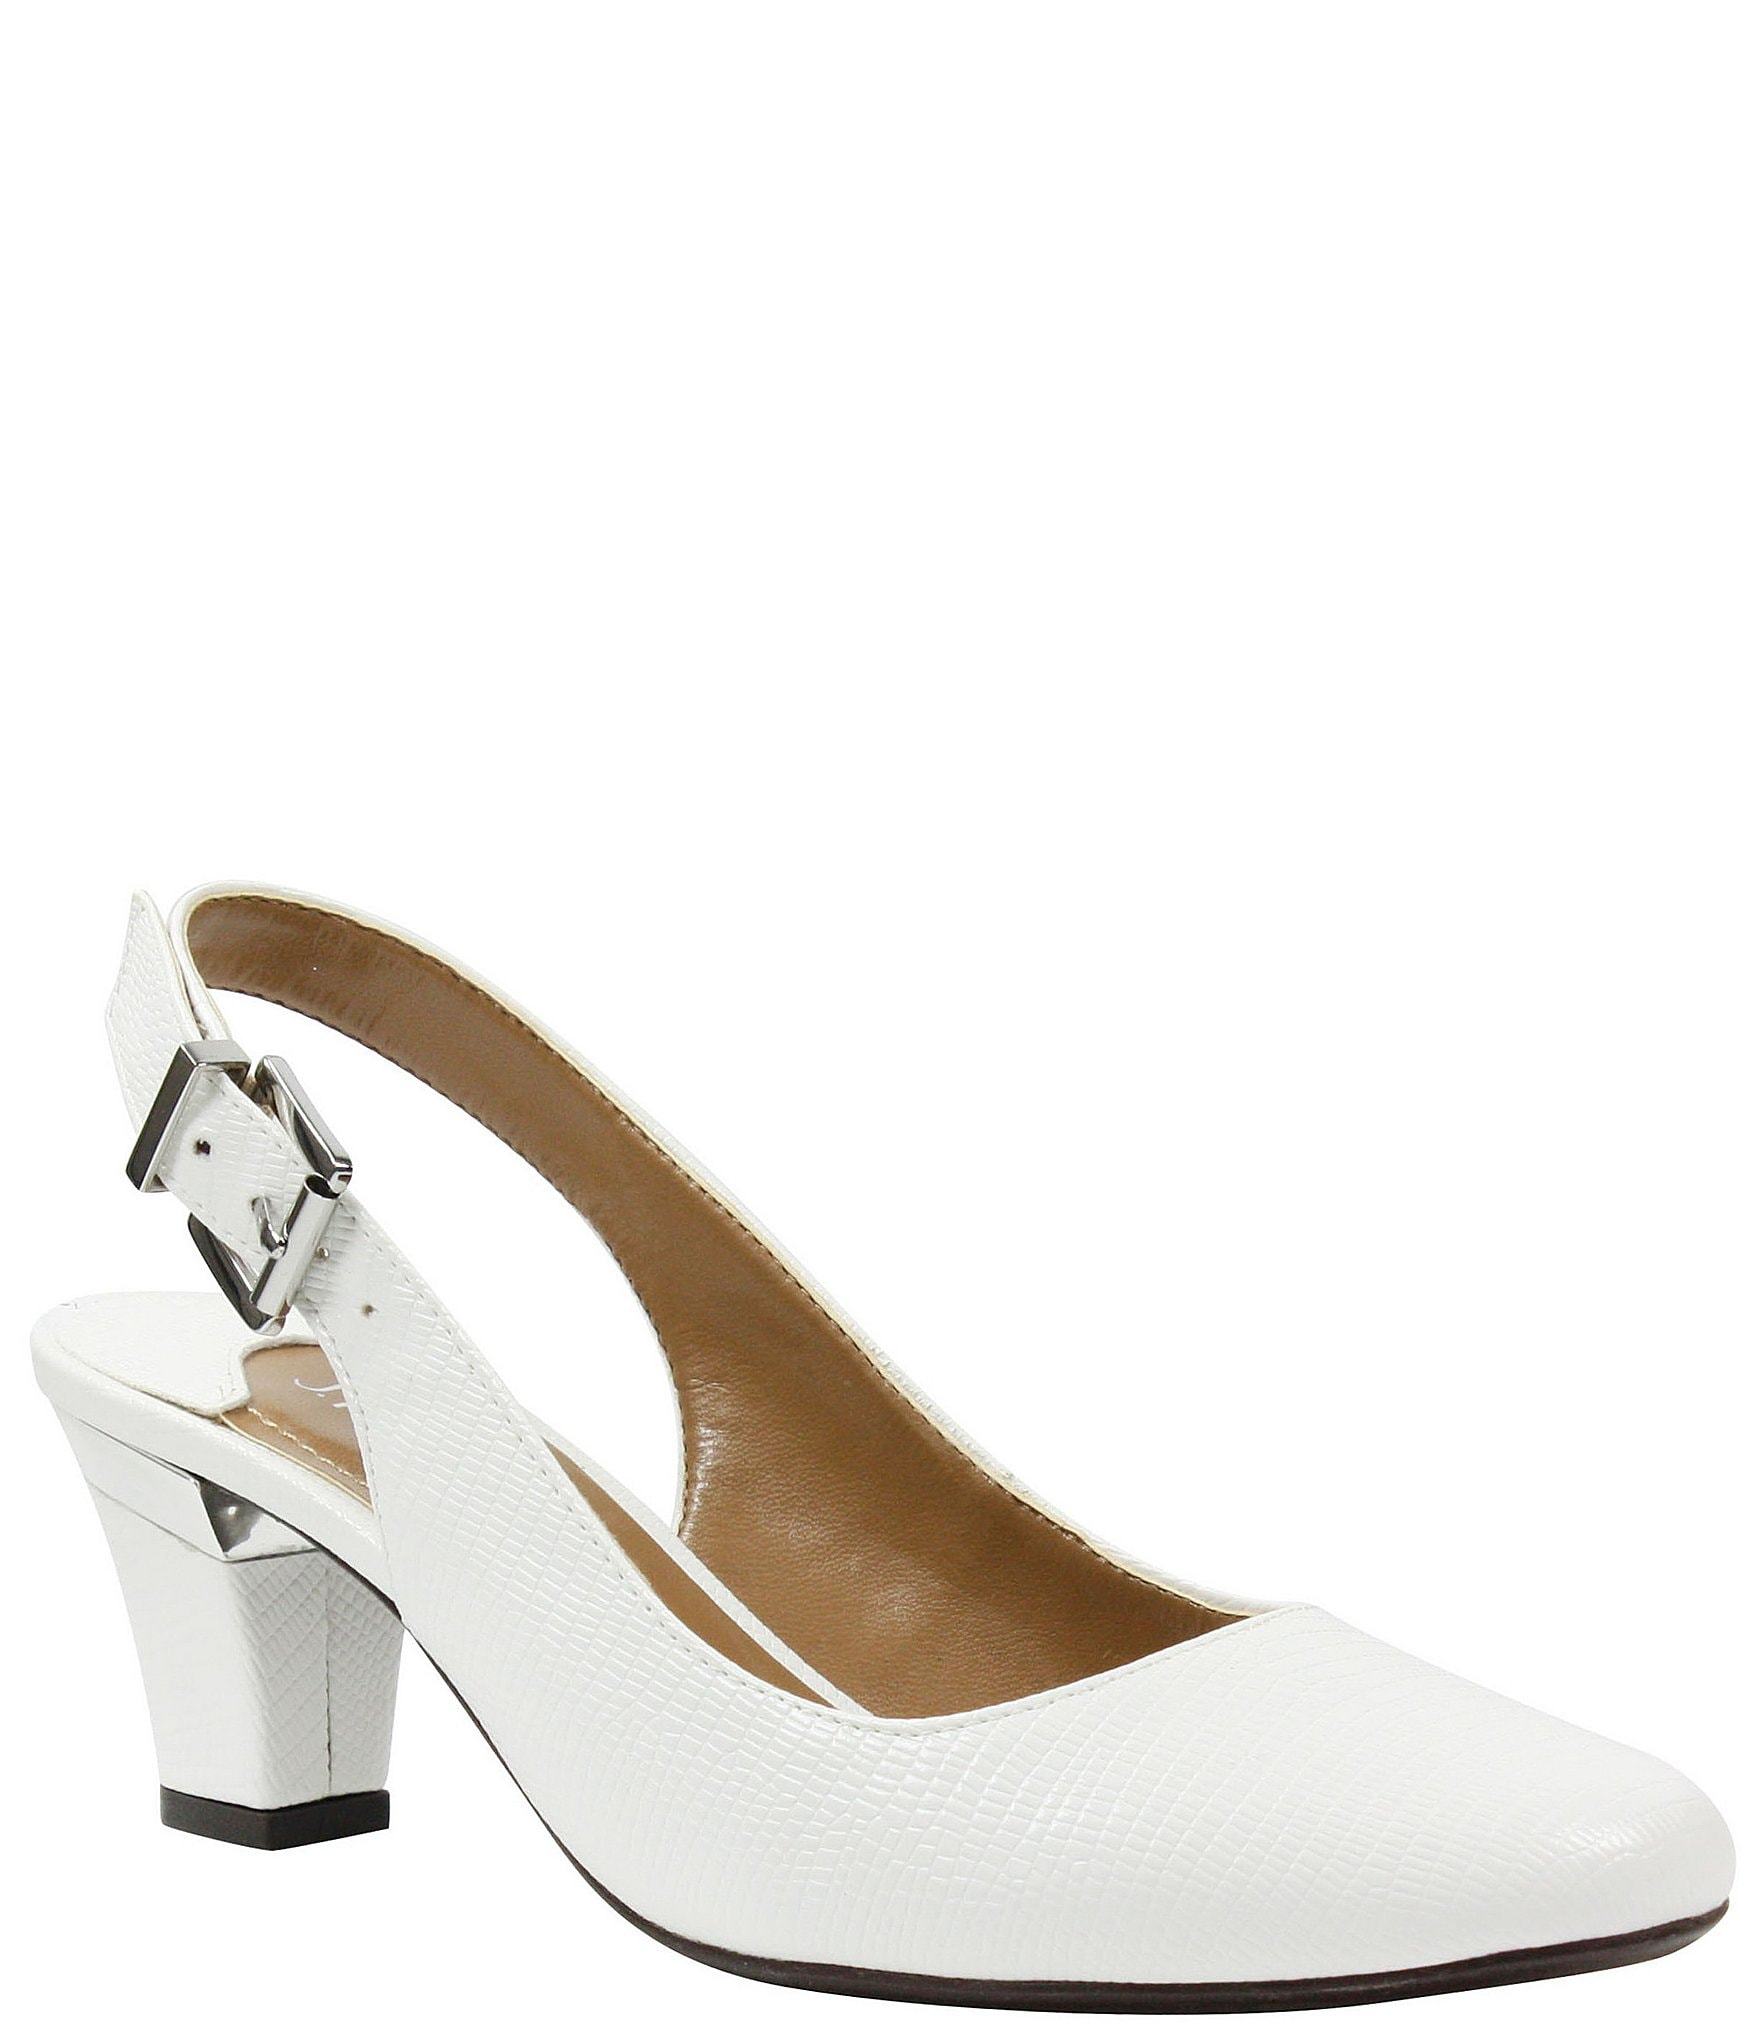 5f1f3ab0dfc White Women s Heels